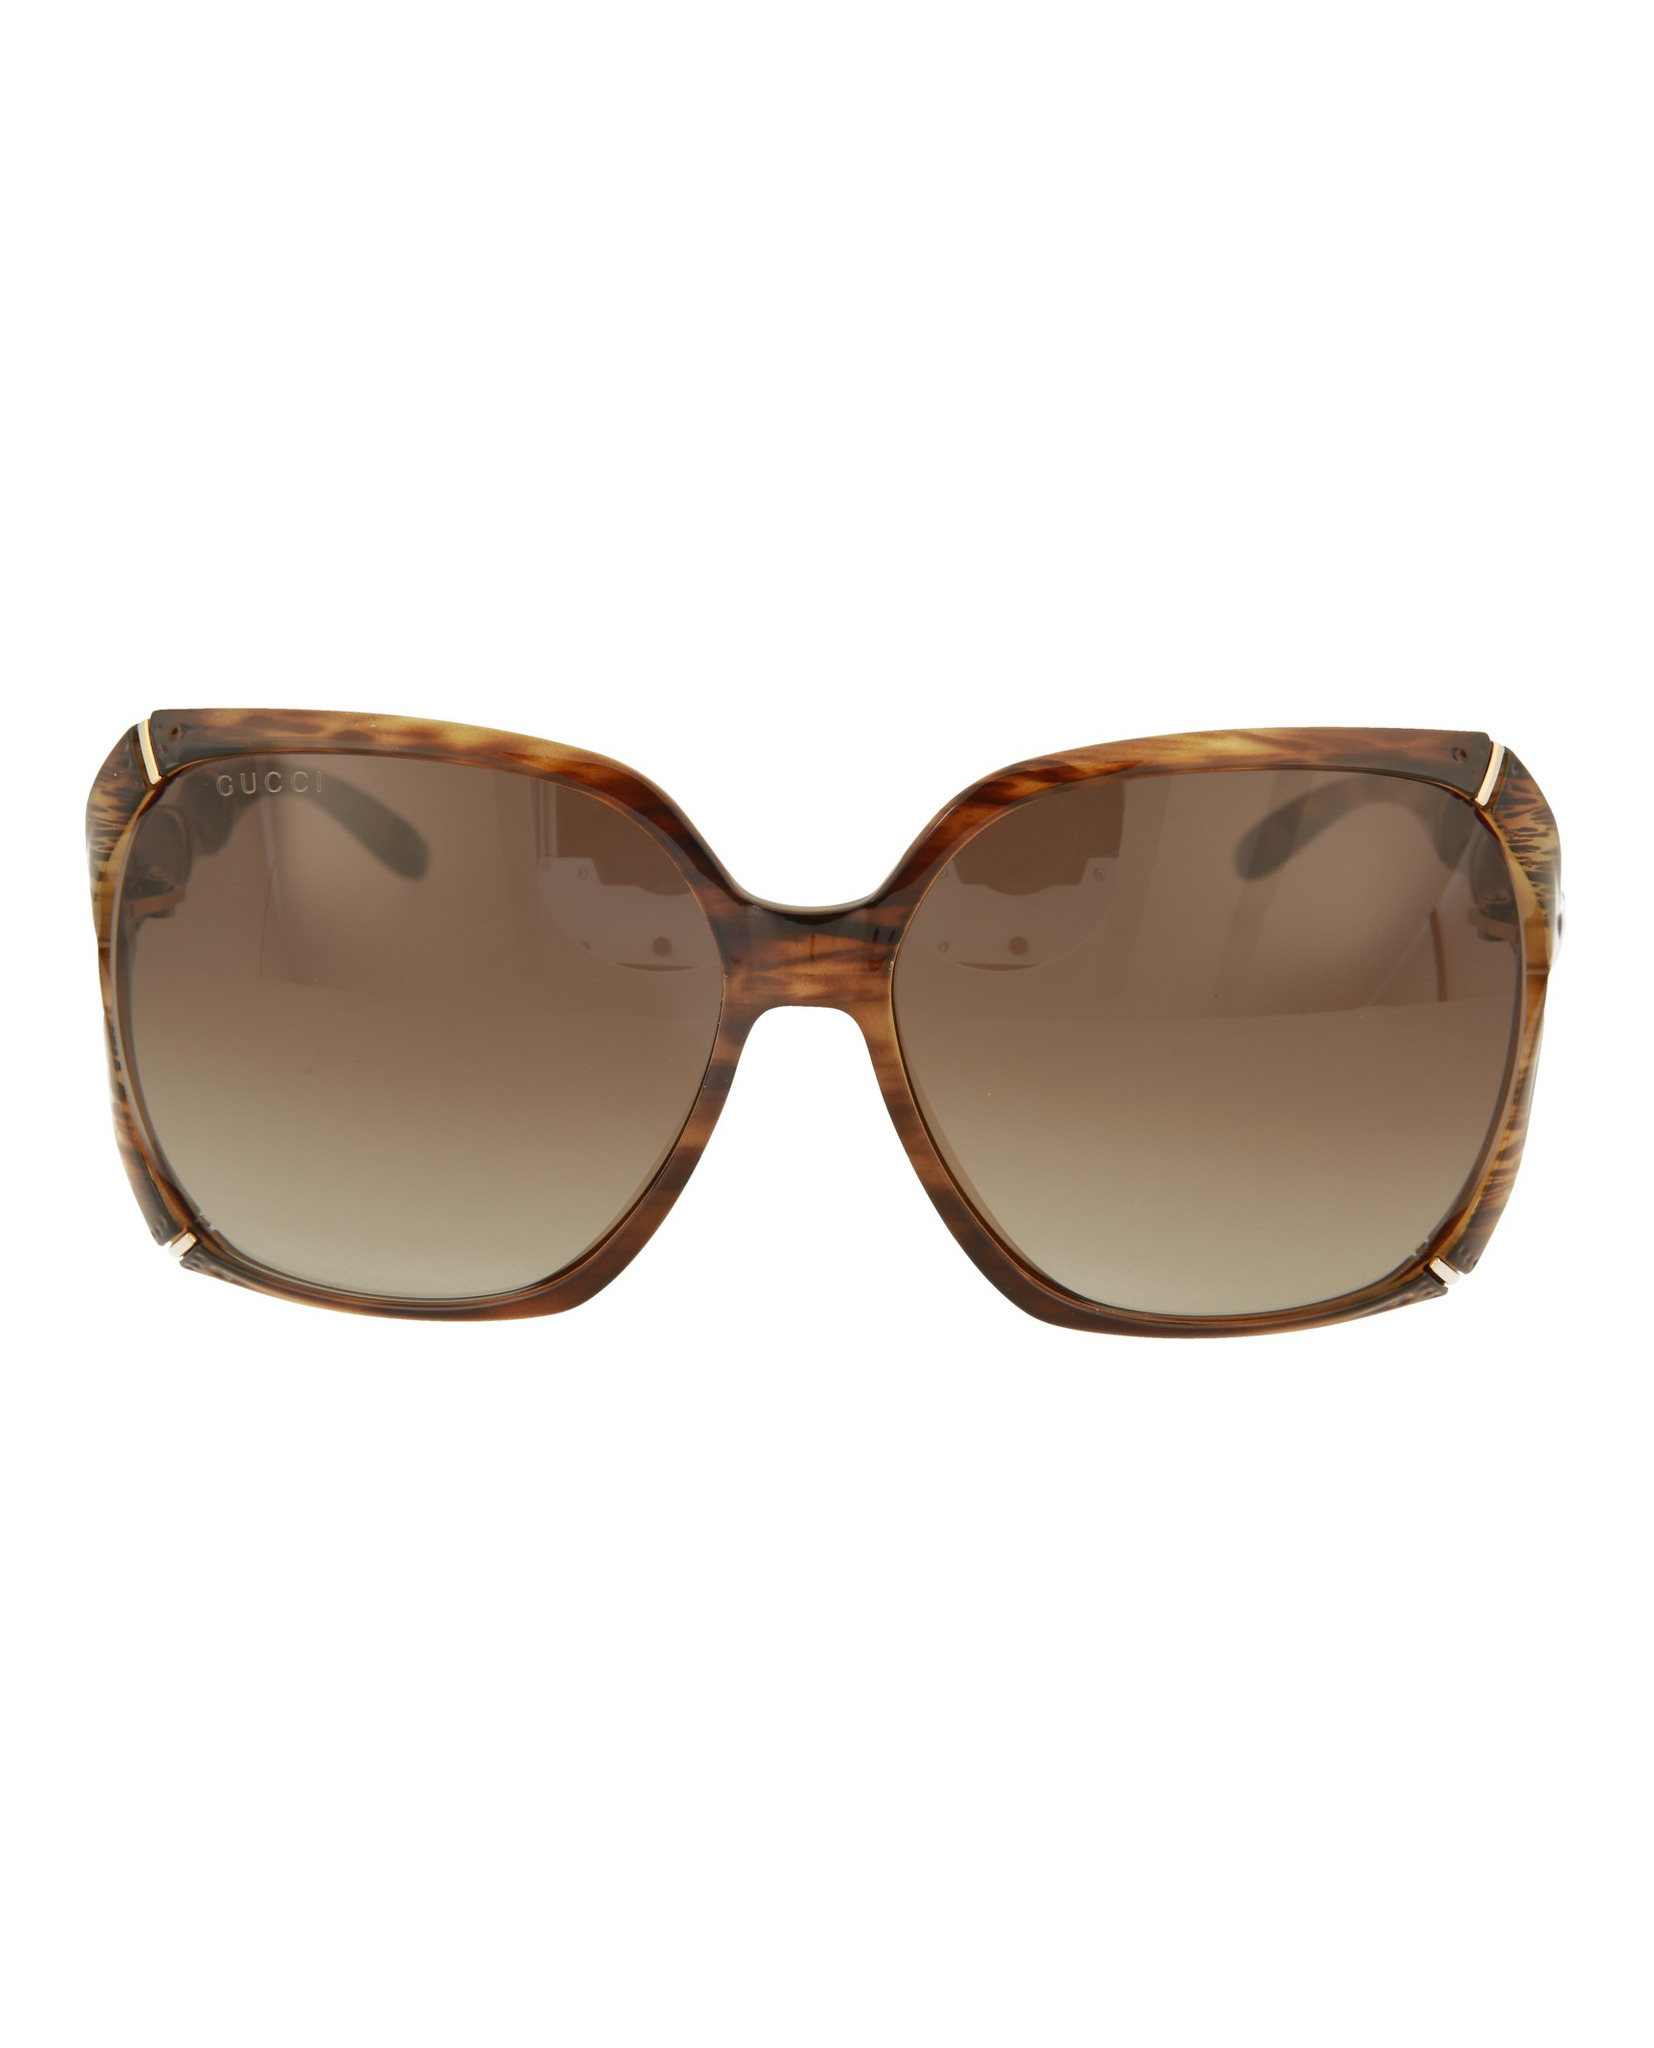 d2f1bb4c59 Gucci Womens Oversized Sunglasses GG0505S-30006508-003 191966105523 ...